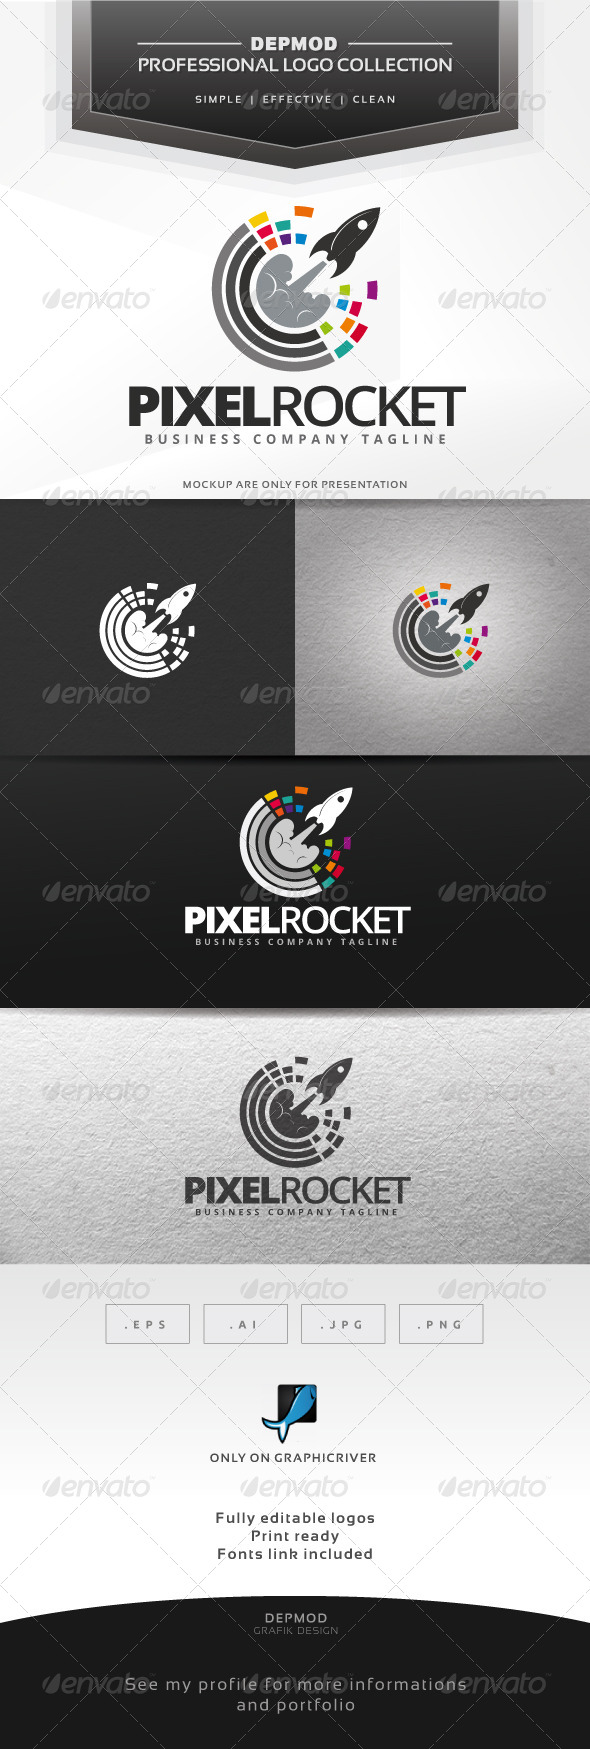 GraphicRiver Pixel Rocket Logo 7067828